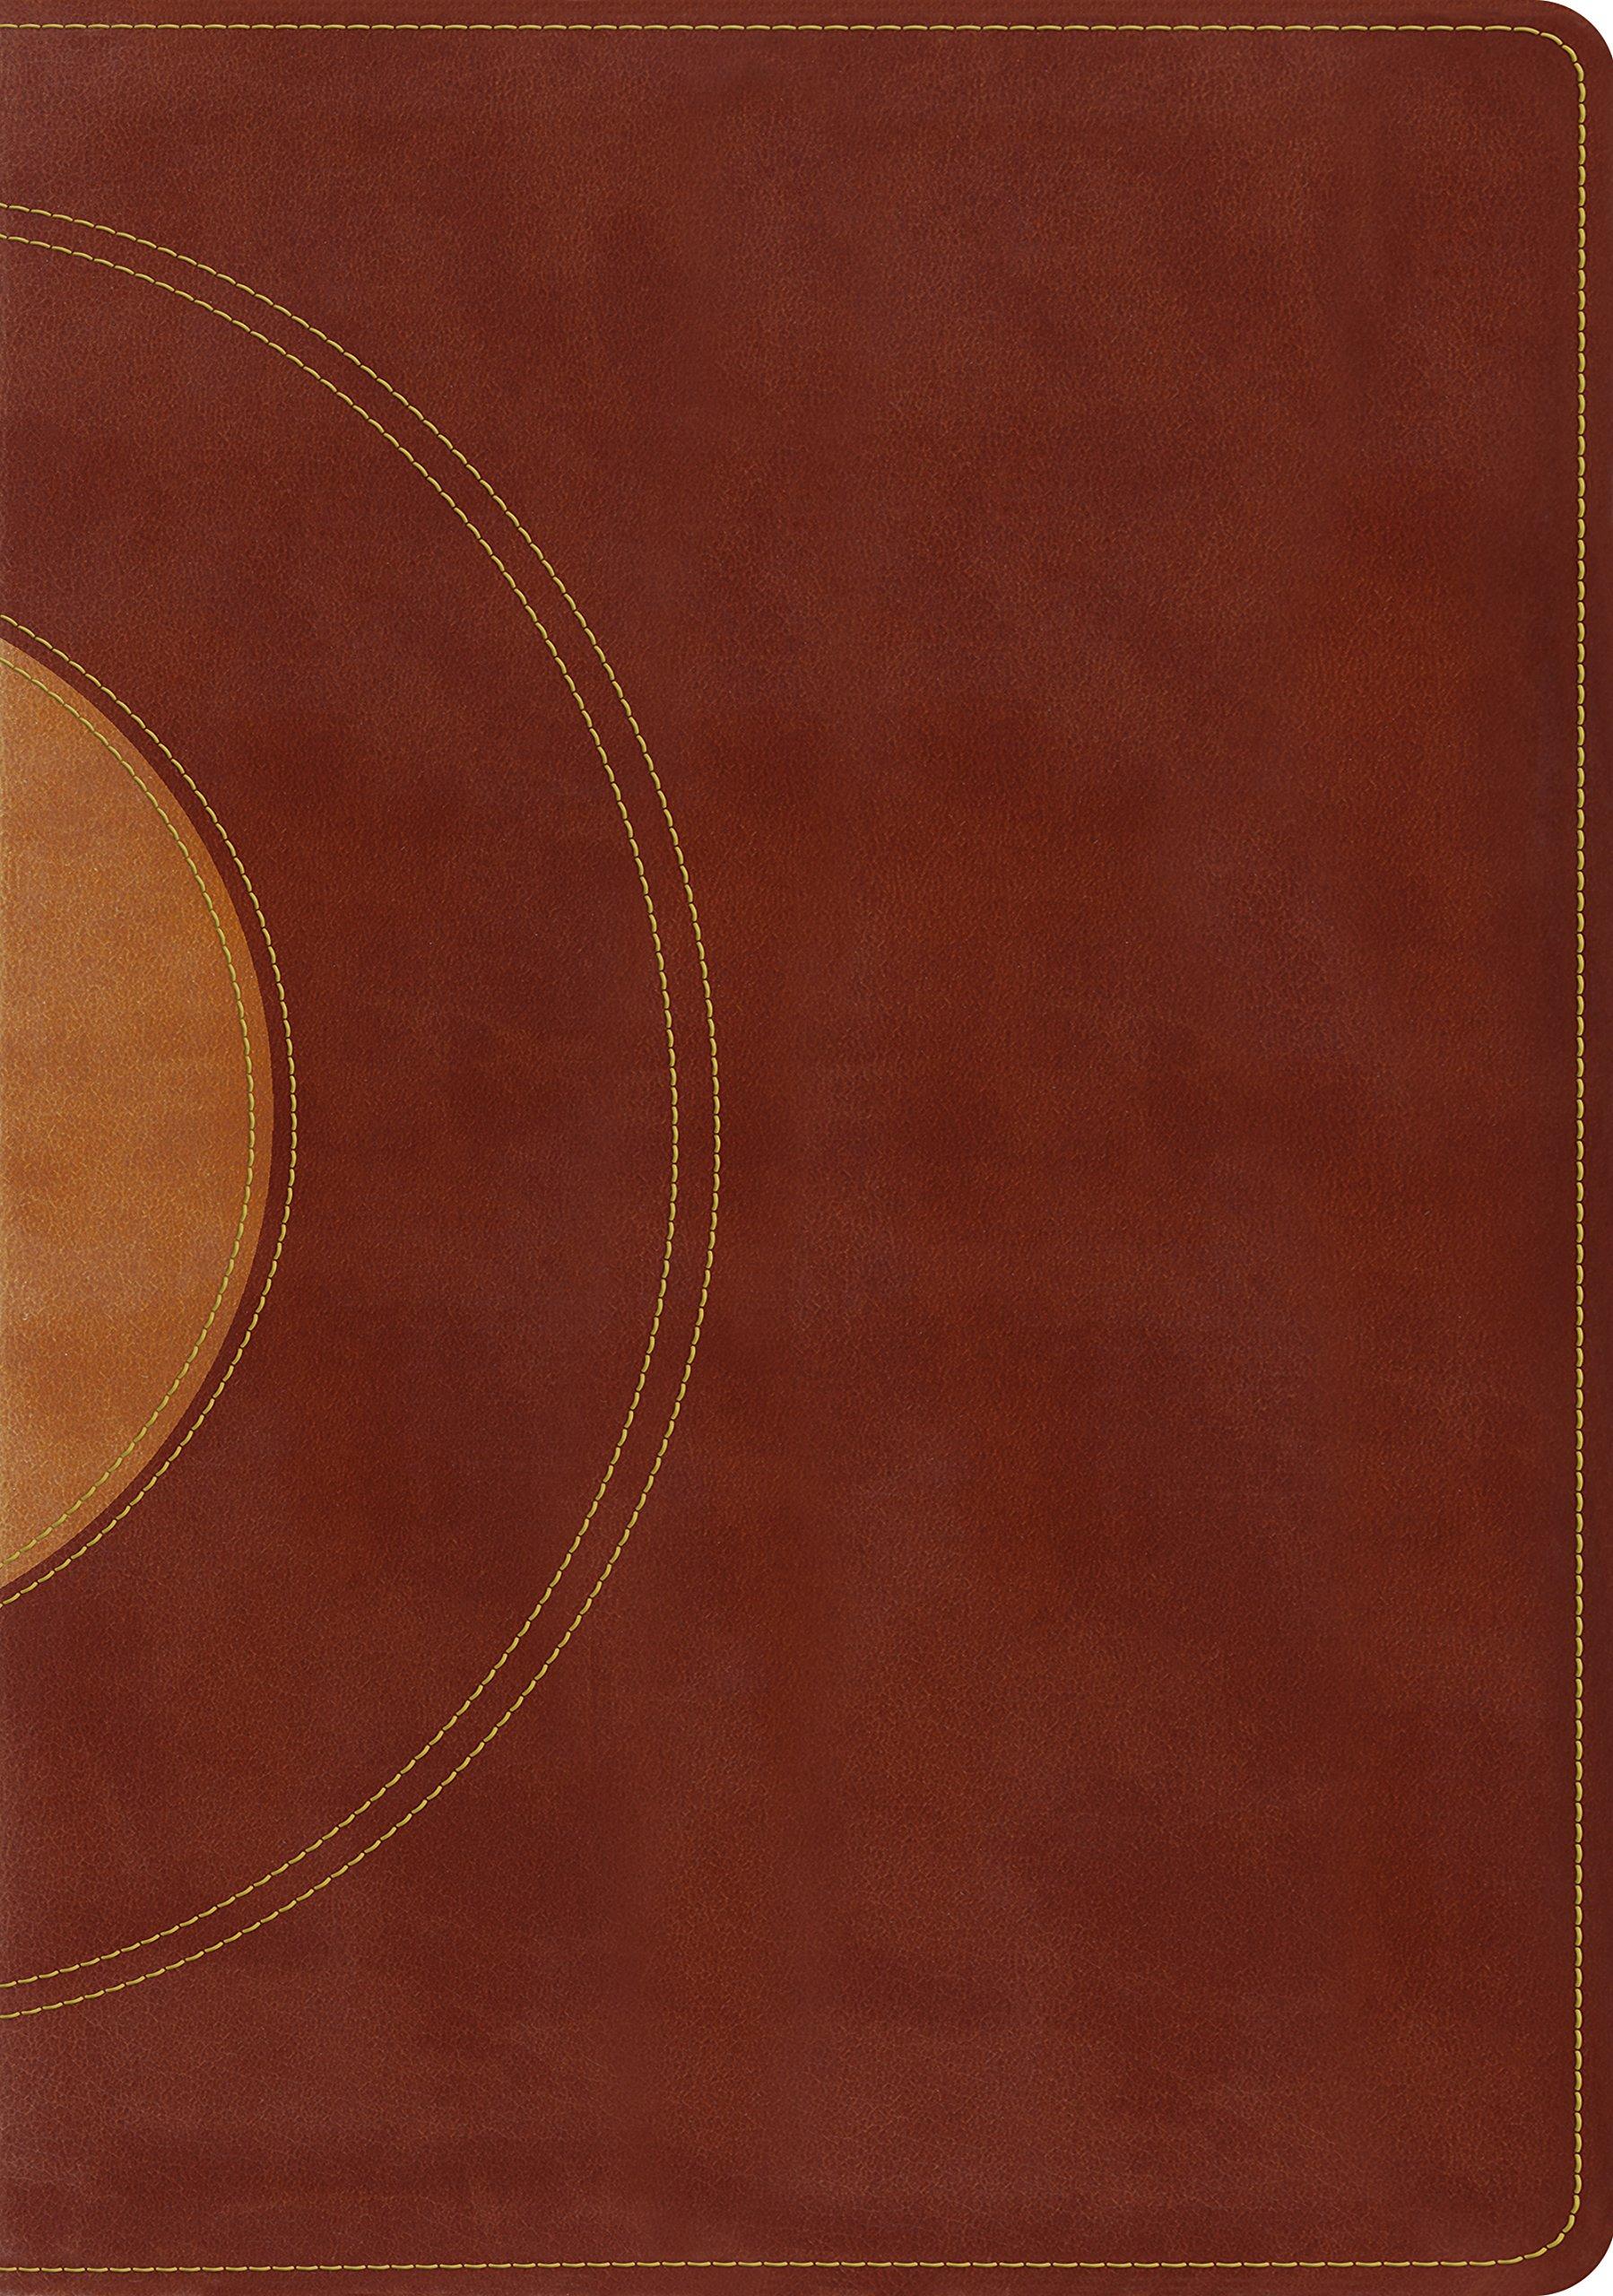 ESV Study Bible (TruTone, Walnut/Taupe, Core Design) pdf